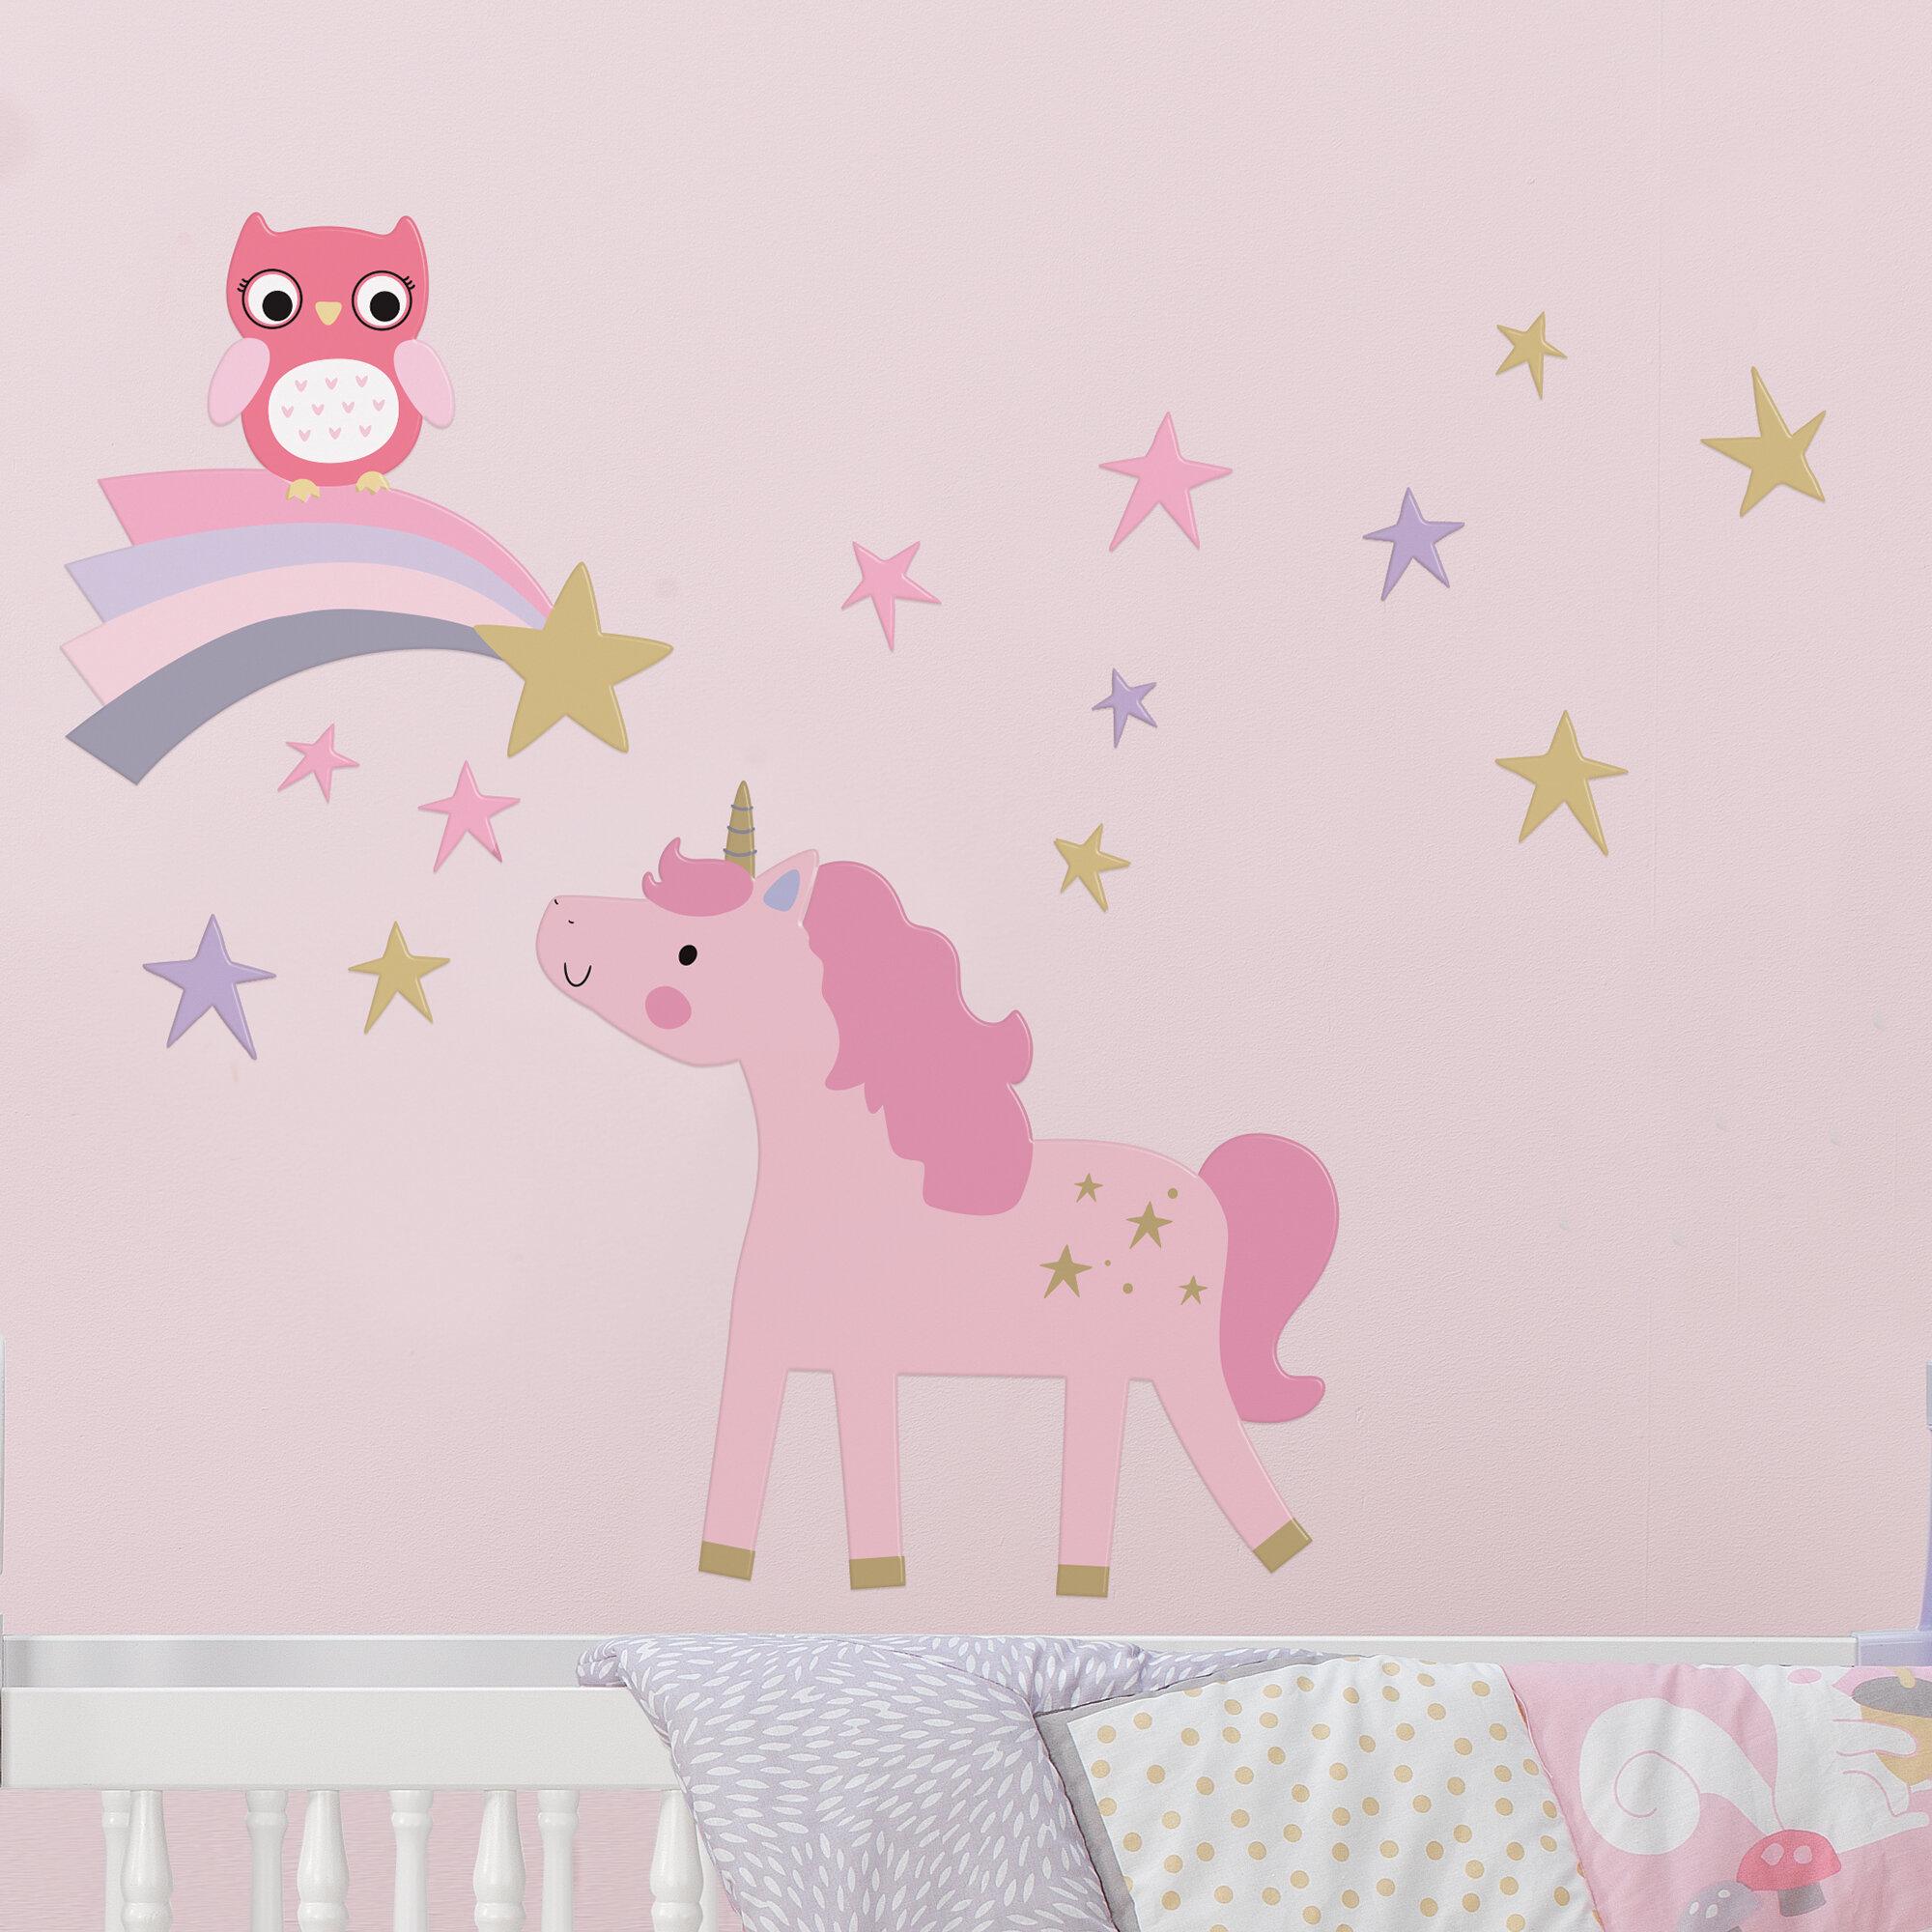 3 Cute Rainbow Unicorn Pony Prints Modern Girls Nursery Wall Art Pictures